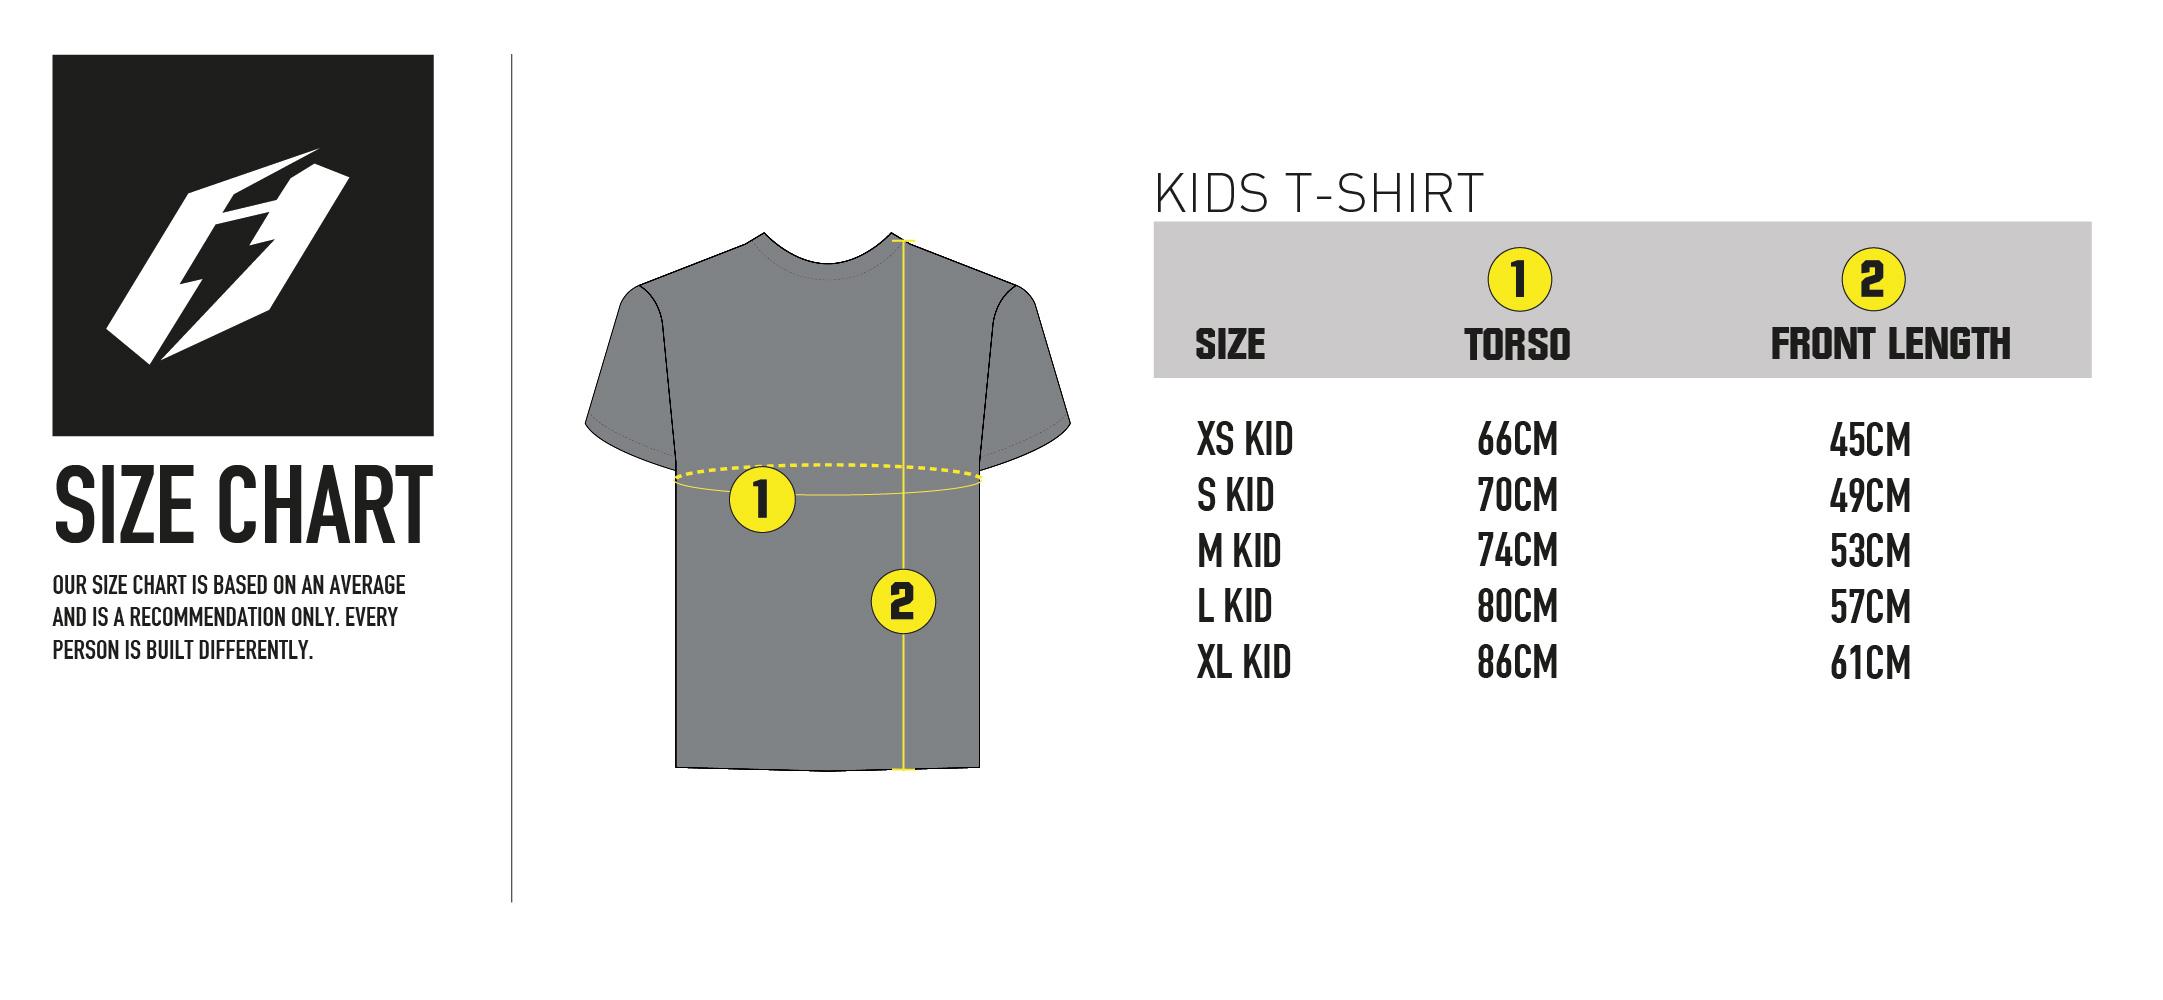 sizechart_casual_tshirt_kid_sizechart_ca